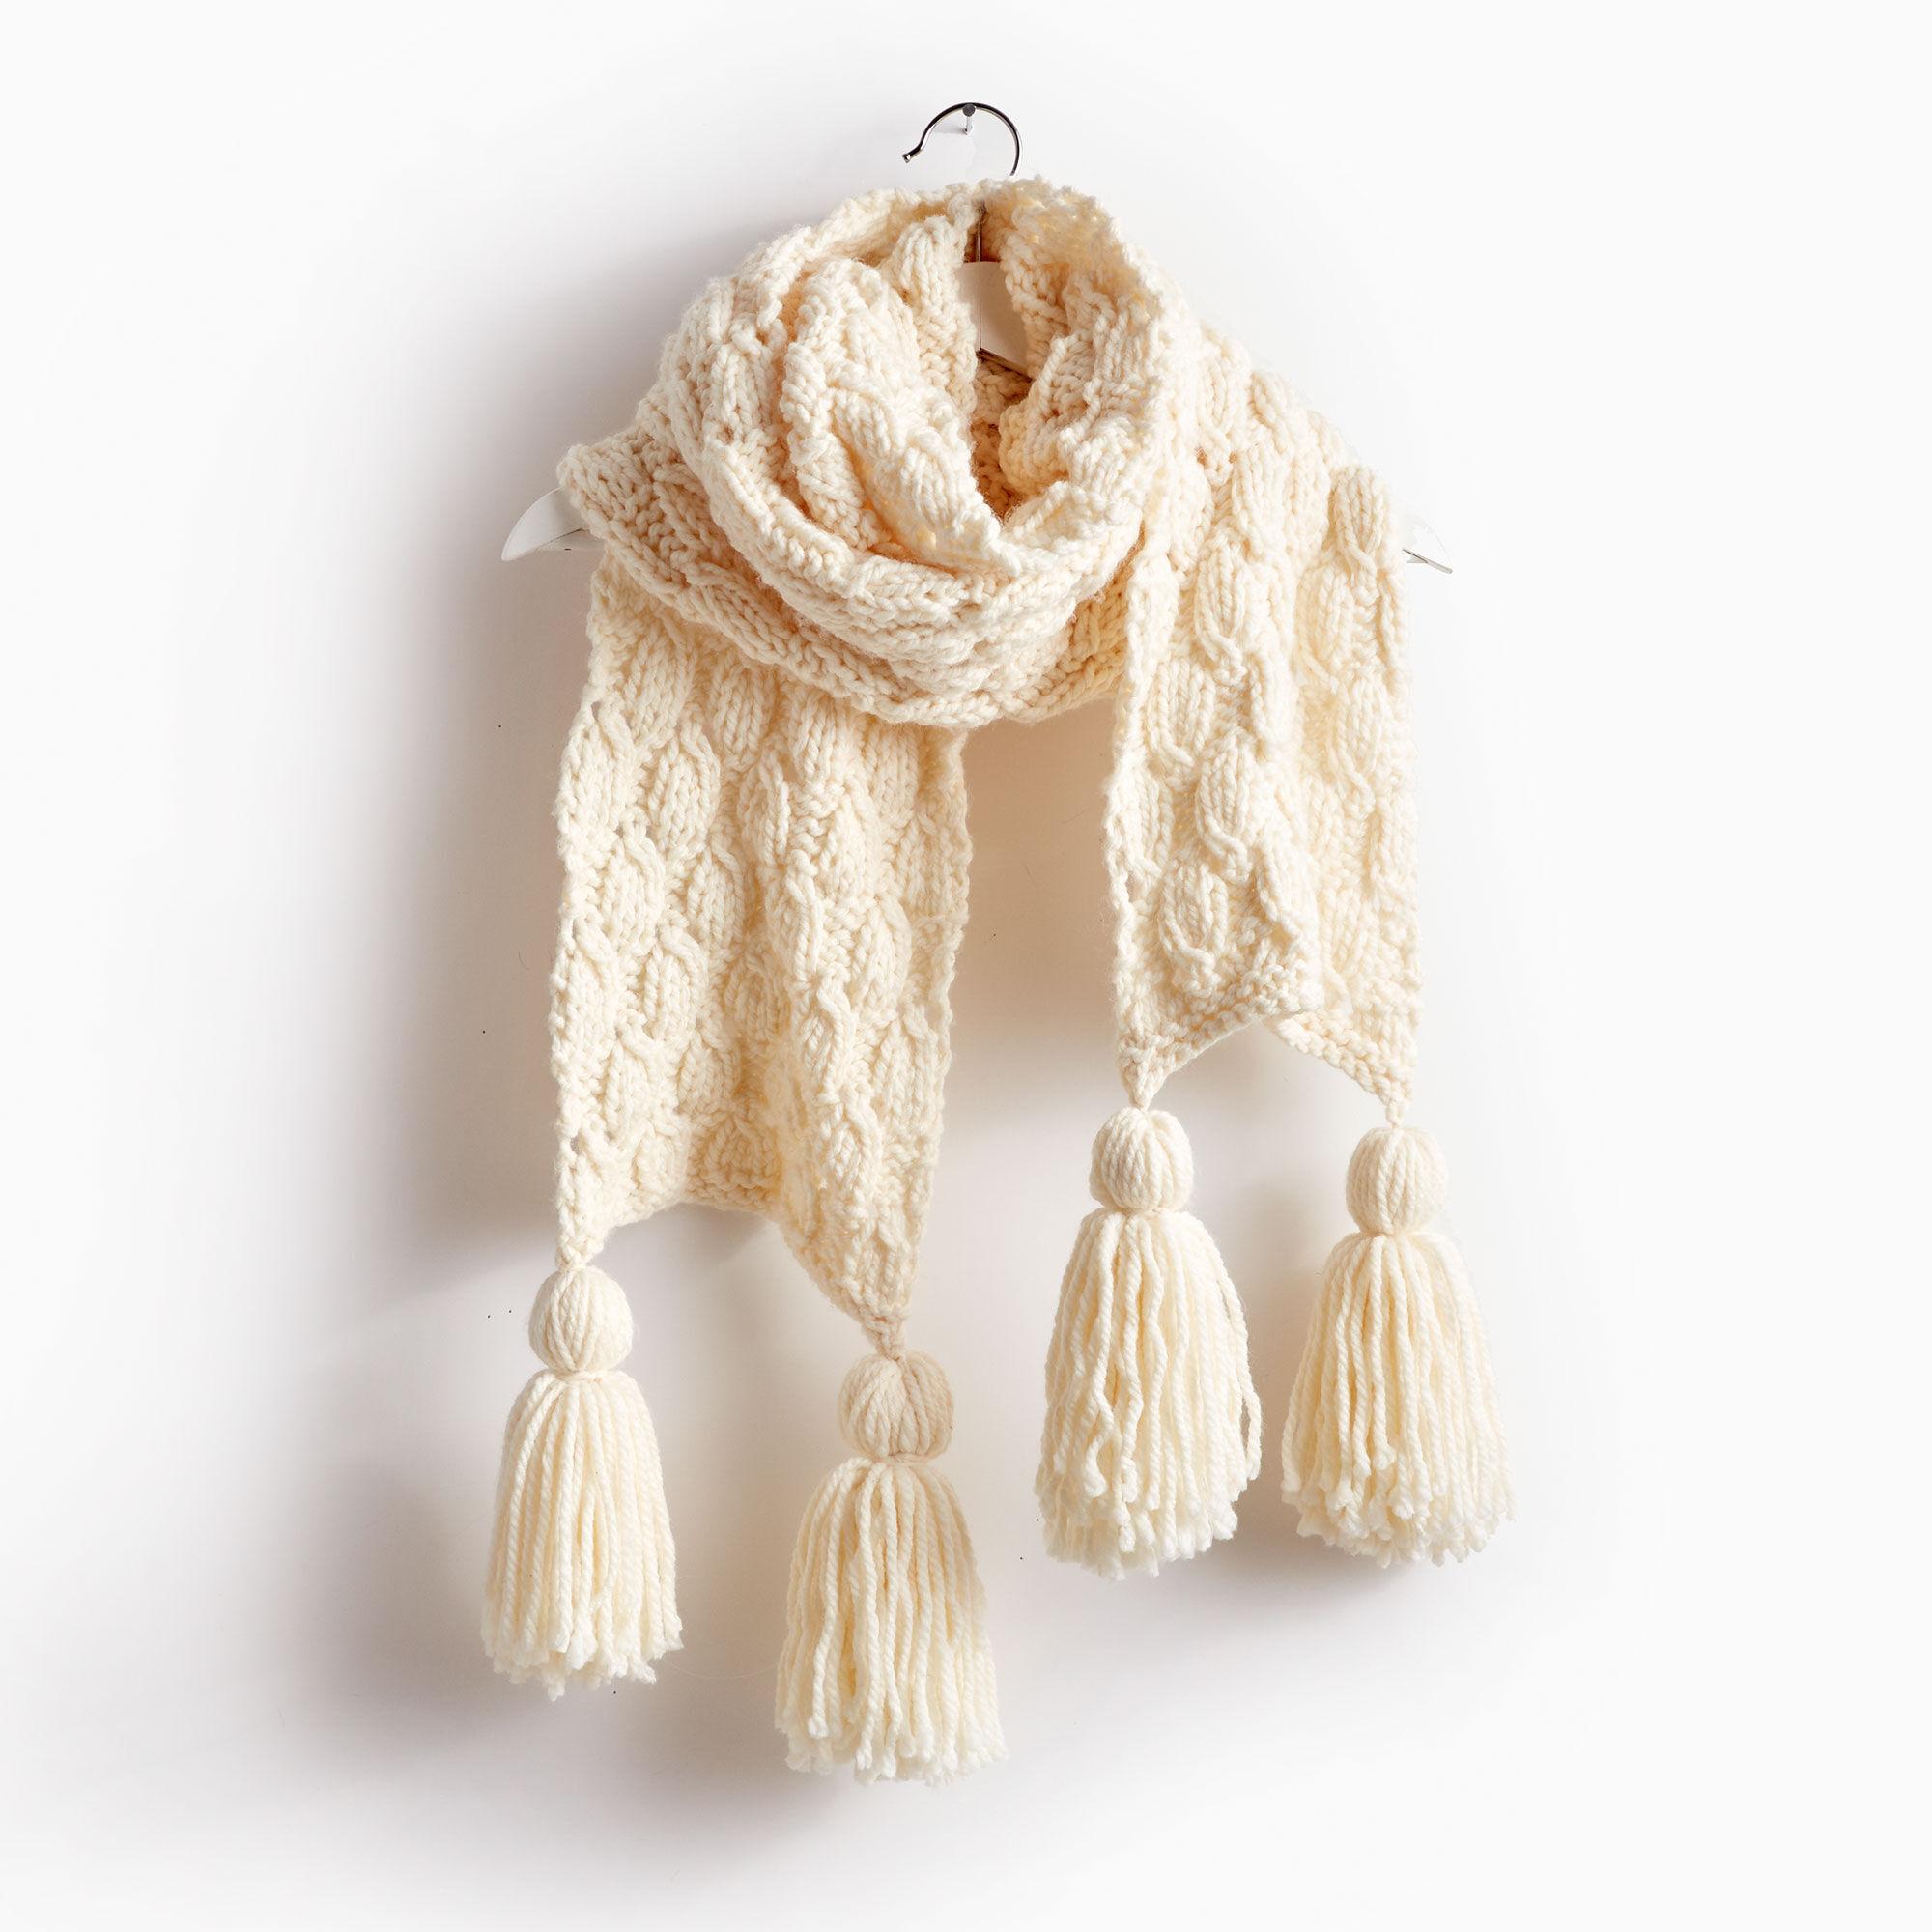 Bernat Make It Big Knit Super Scarf, Natural | Yarnspirations